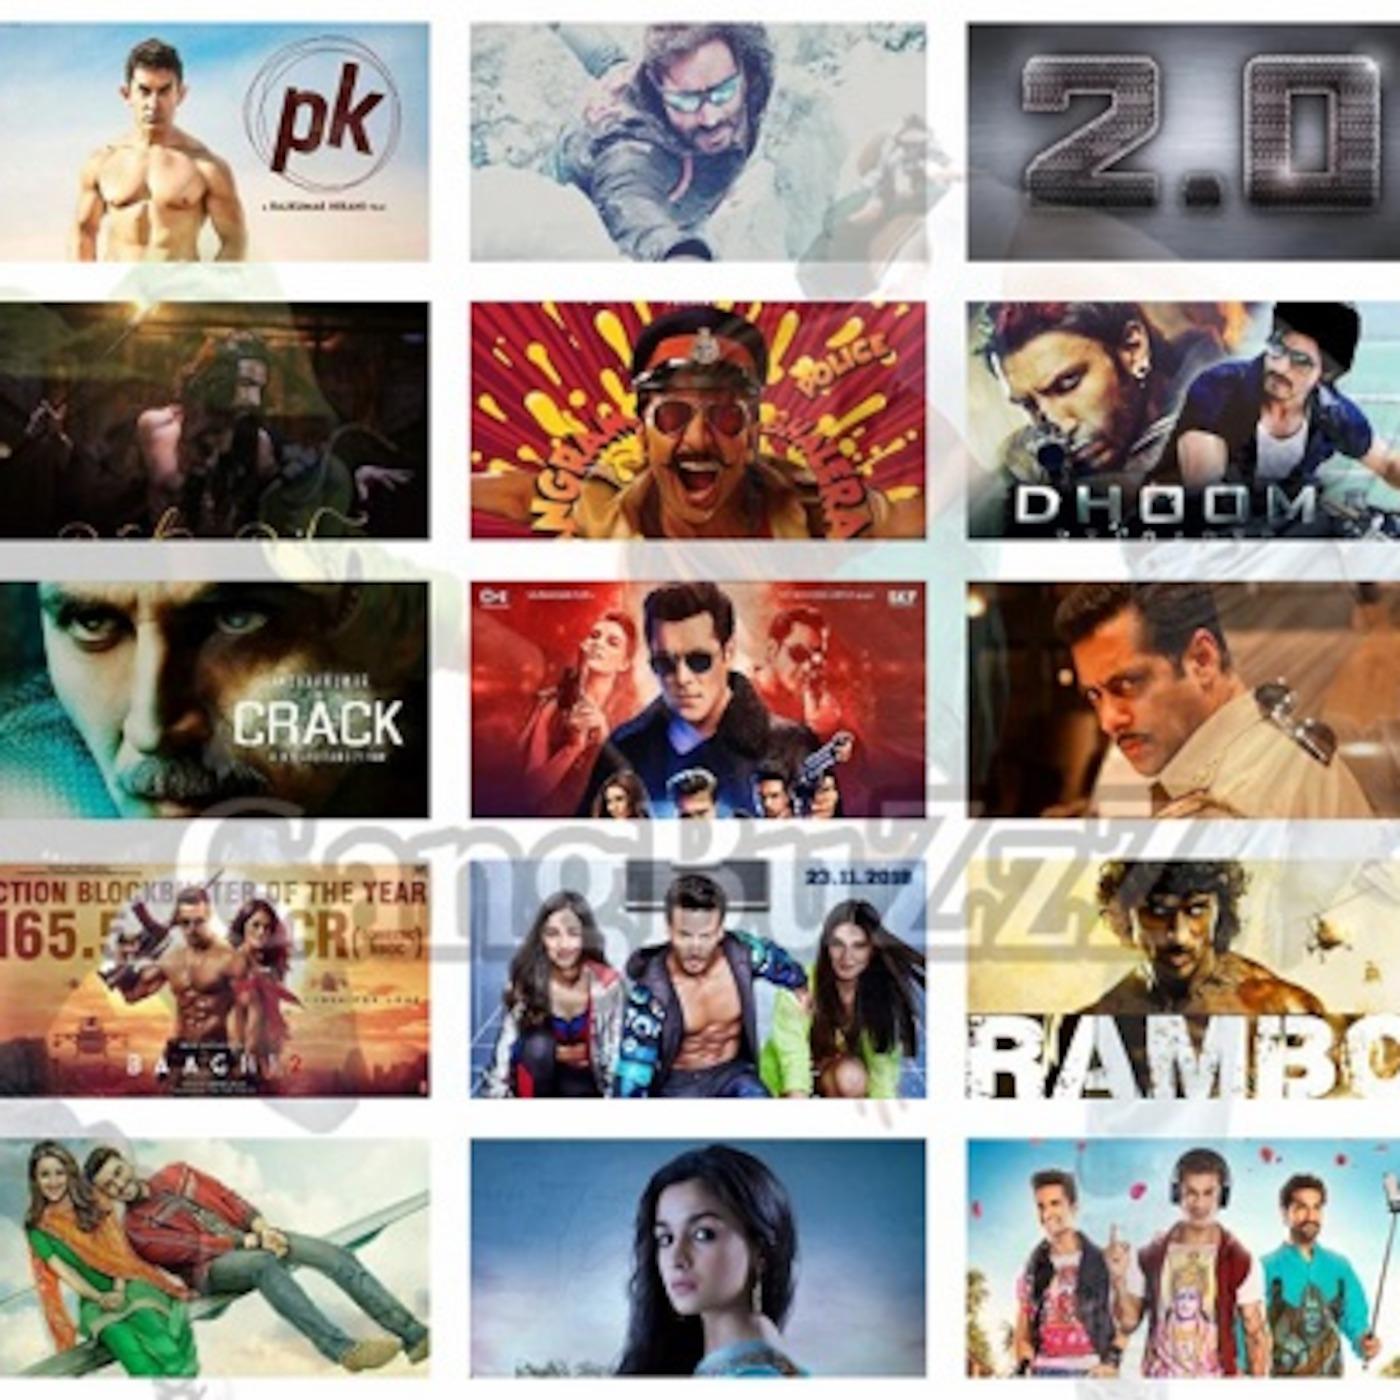 dhadak movie free download mp4 hd